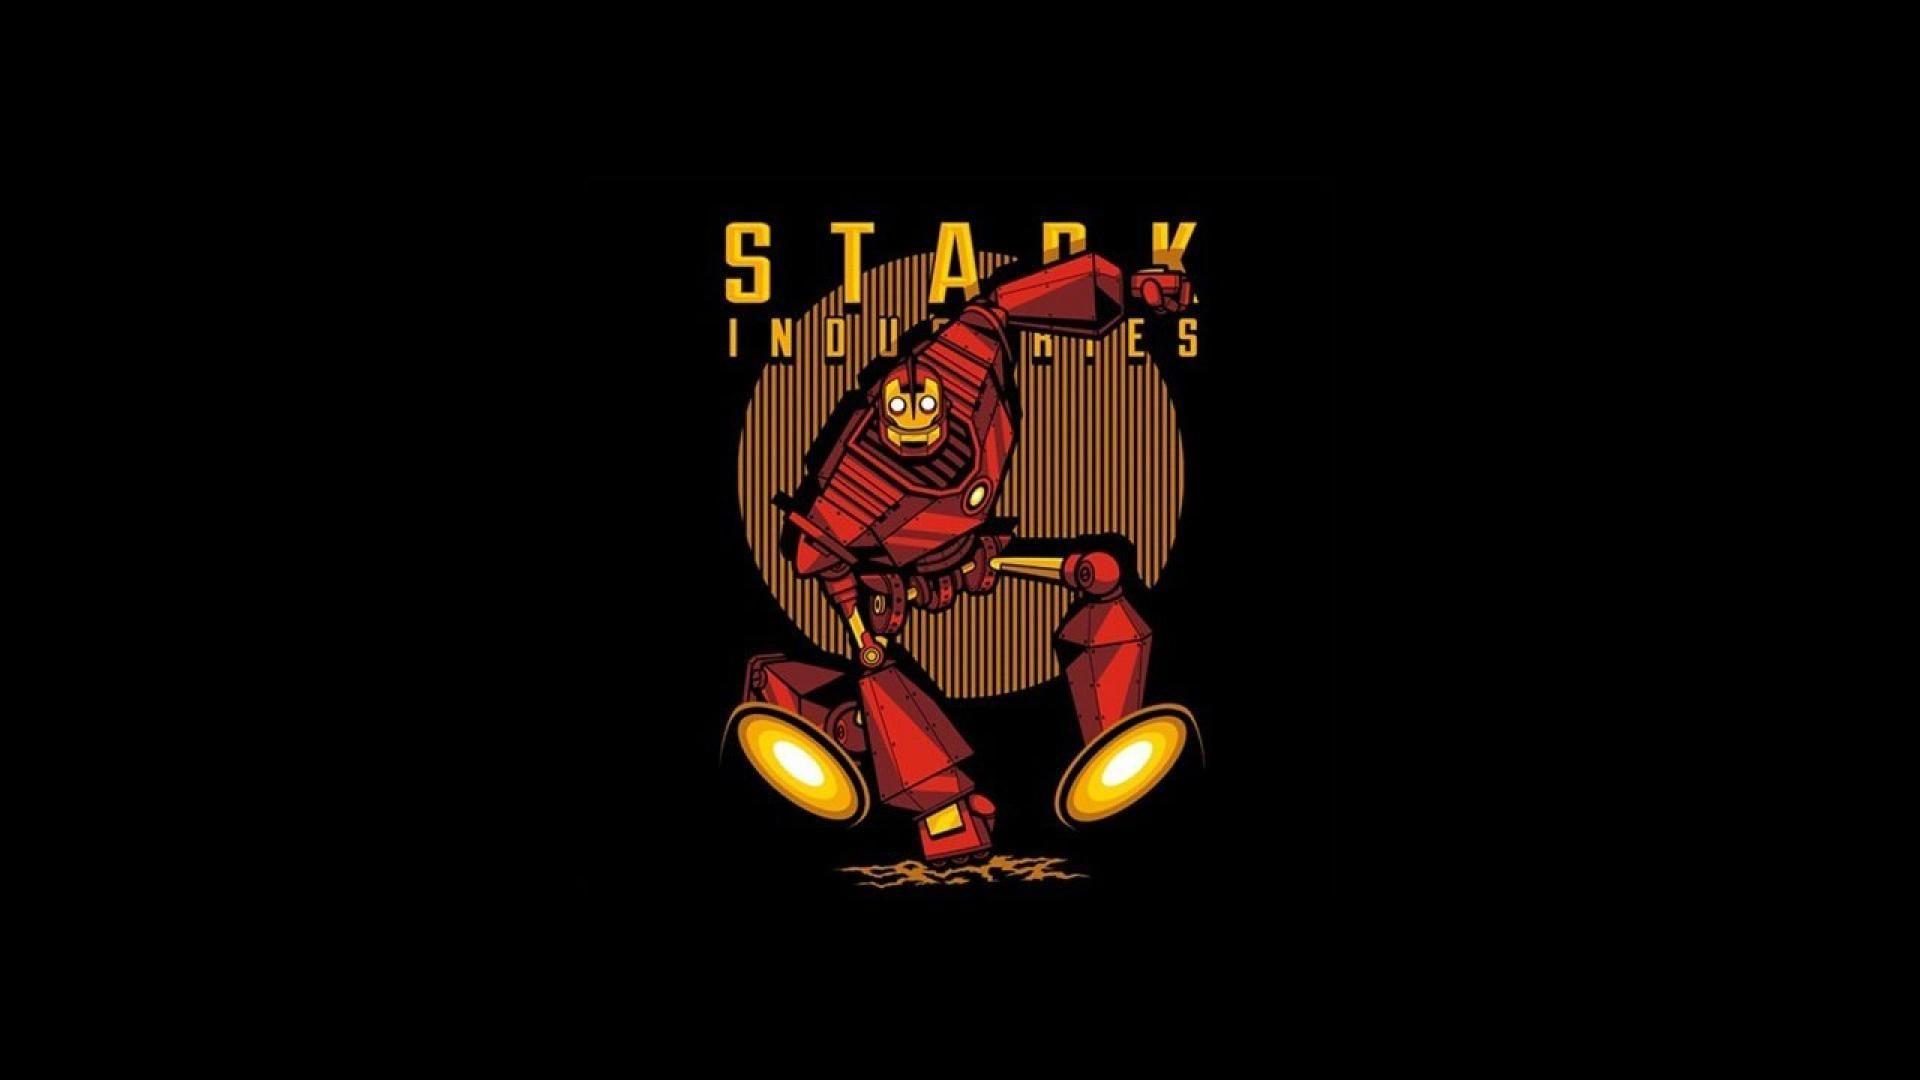 Iron man stark industries hd wallpapers wallpaper cave - Iron man cartoon hd ...